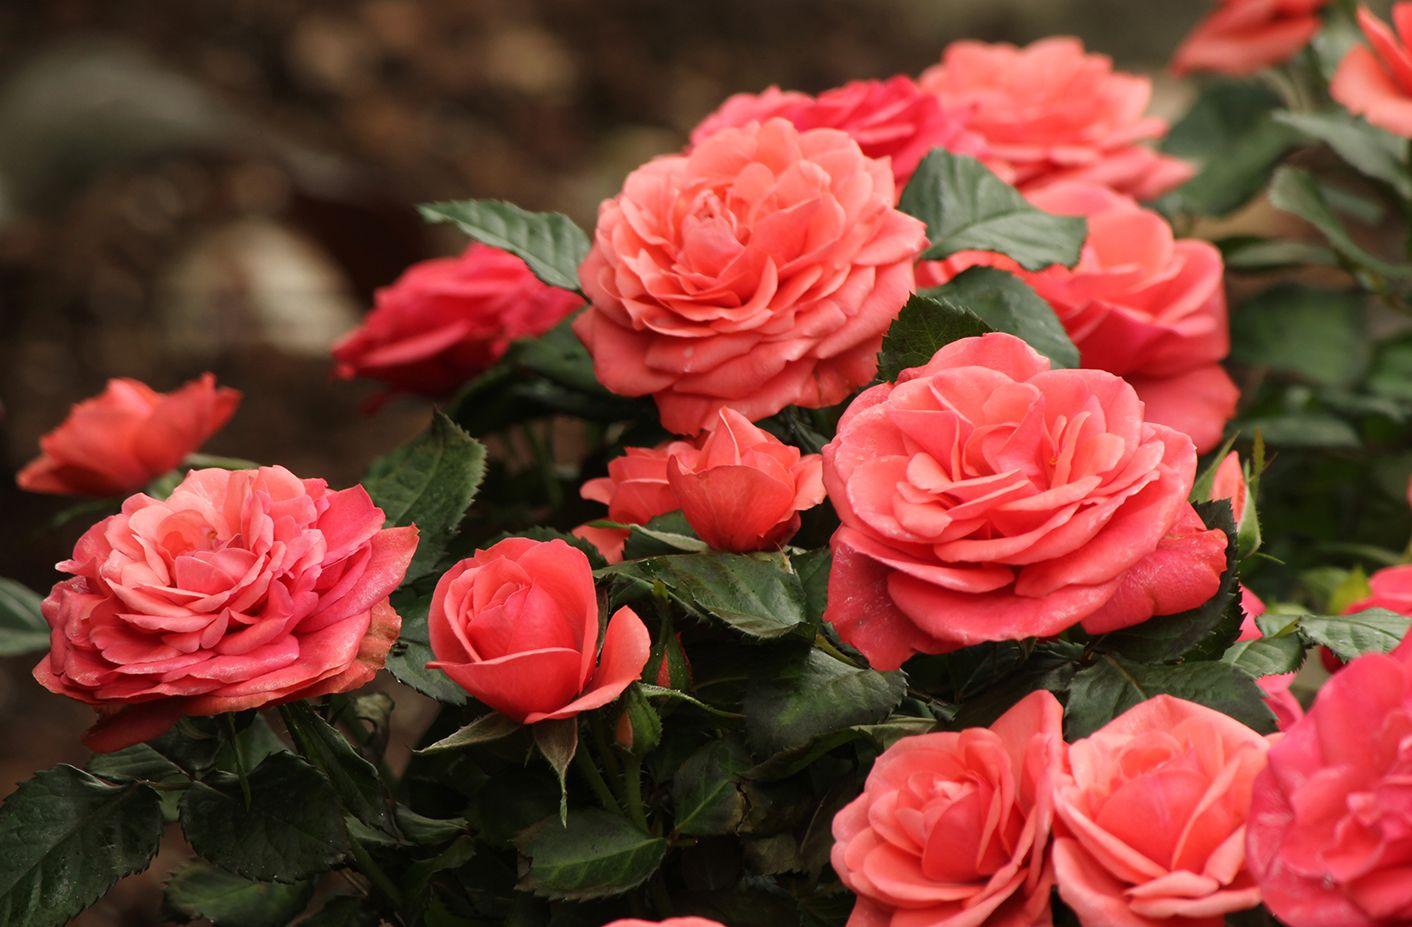 Rocket Farms mini roses Rose, Orange roses, Beautiful